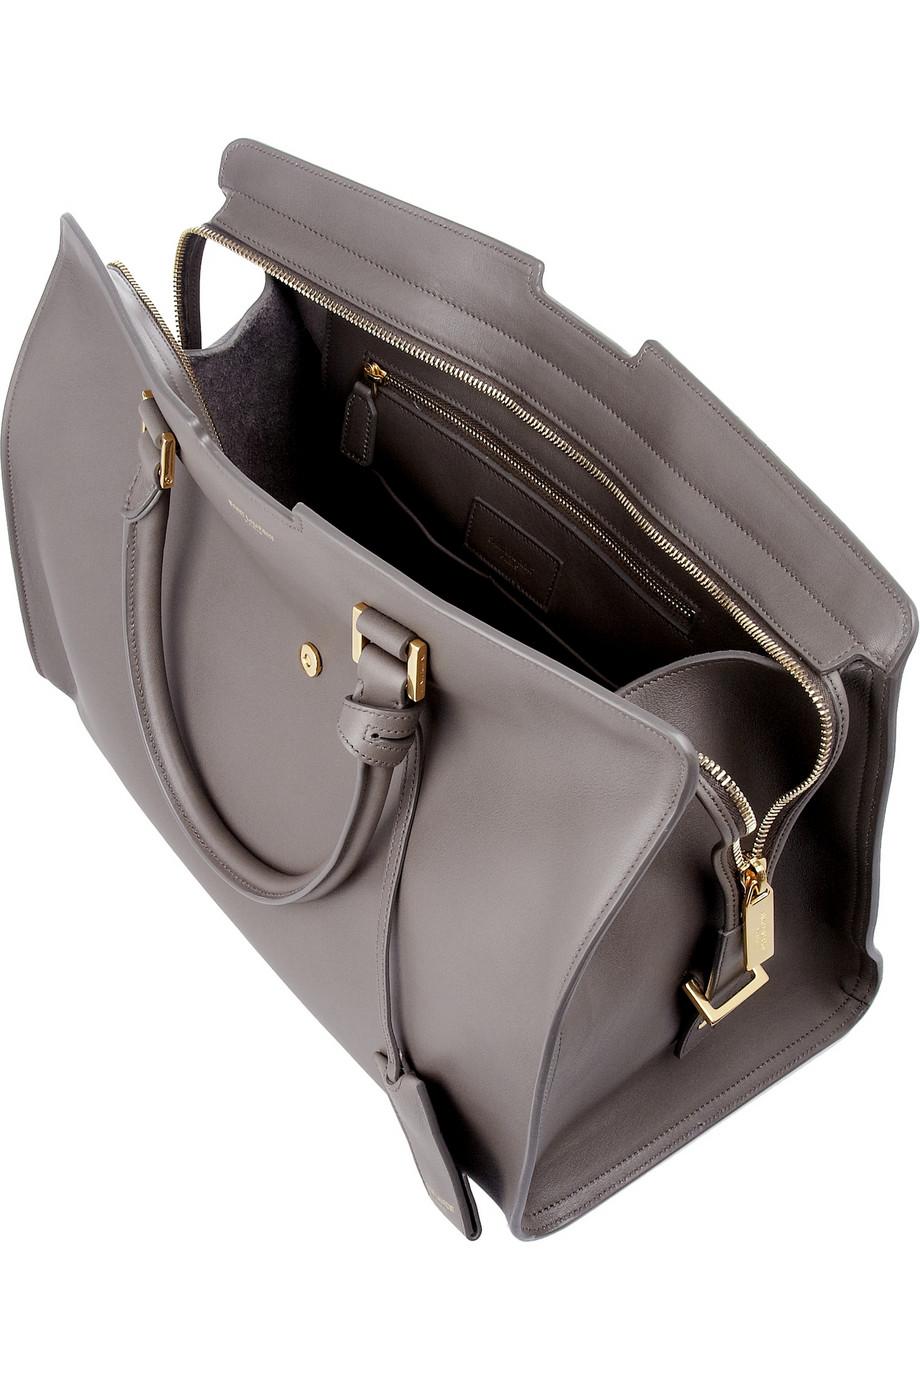 yves saint laurent belle de jour clutch bag large - y ligne soft leather bag, red